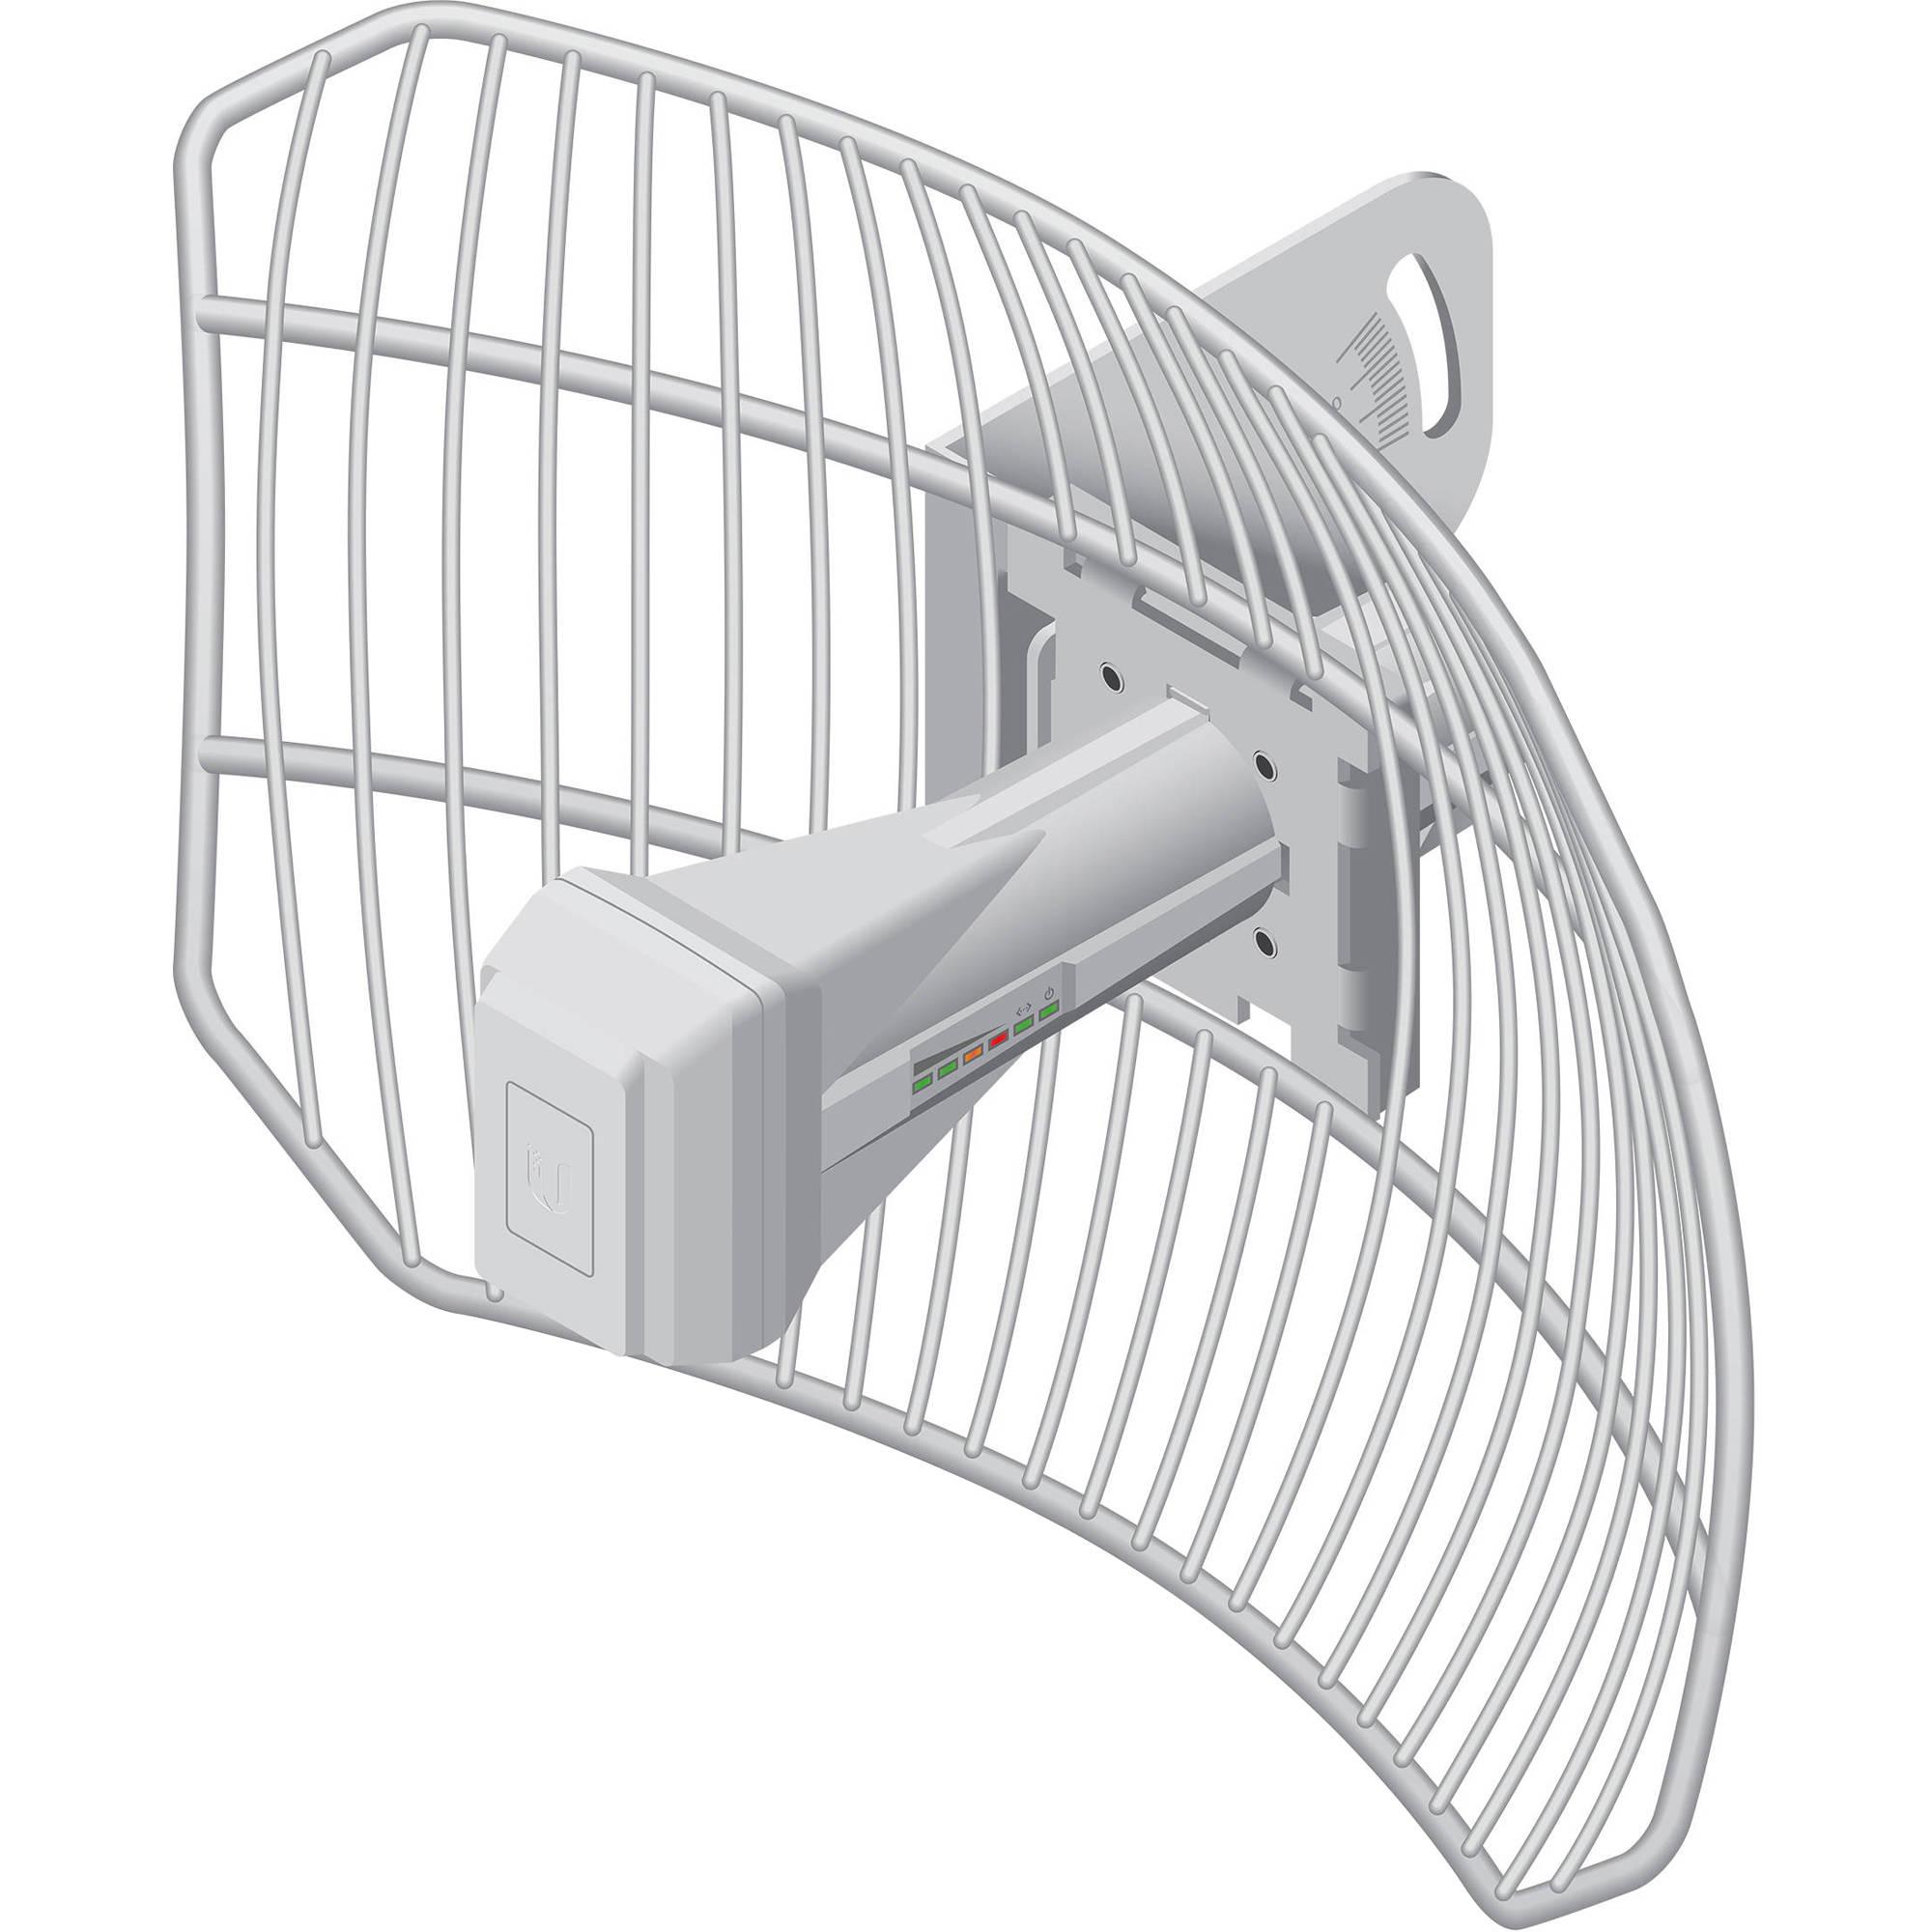 Ubiquiti AirGrid M2 Antenna Drivers for Windows